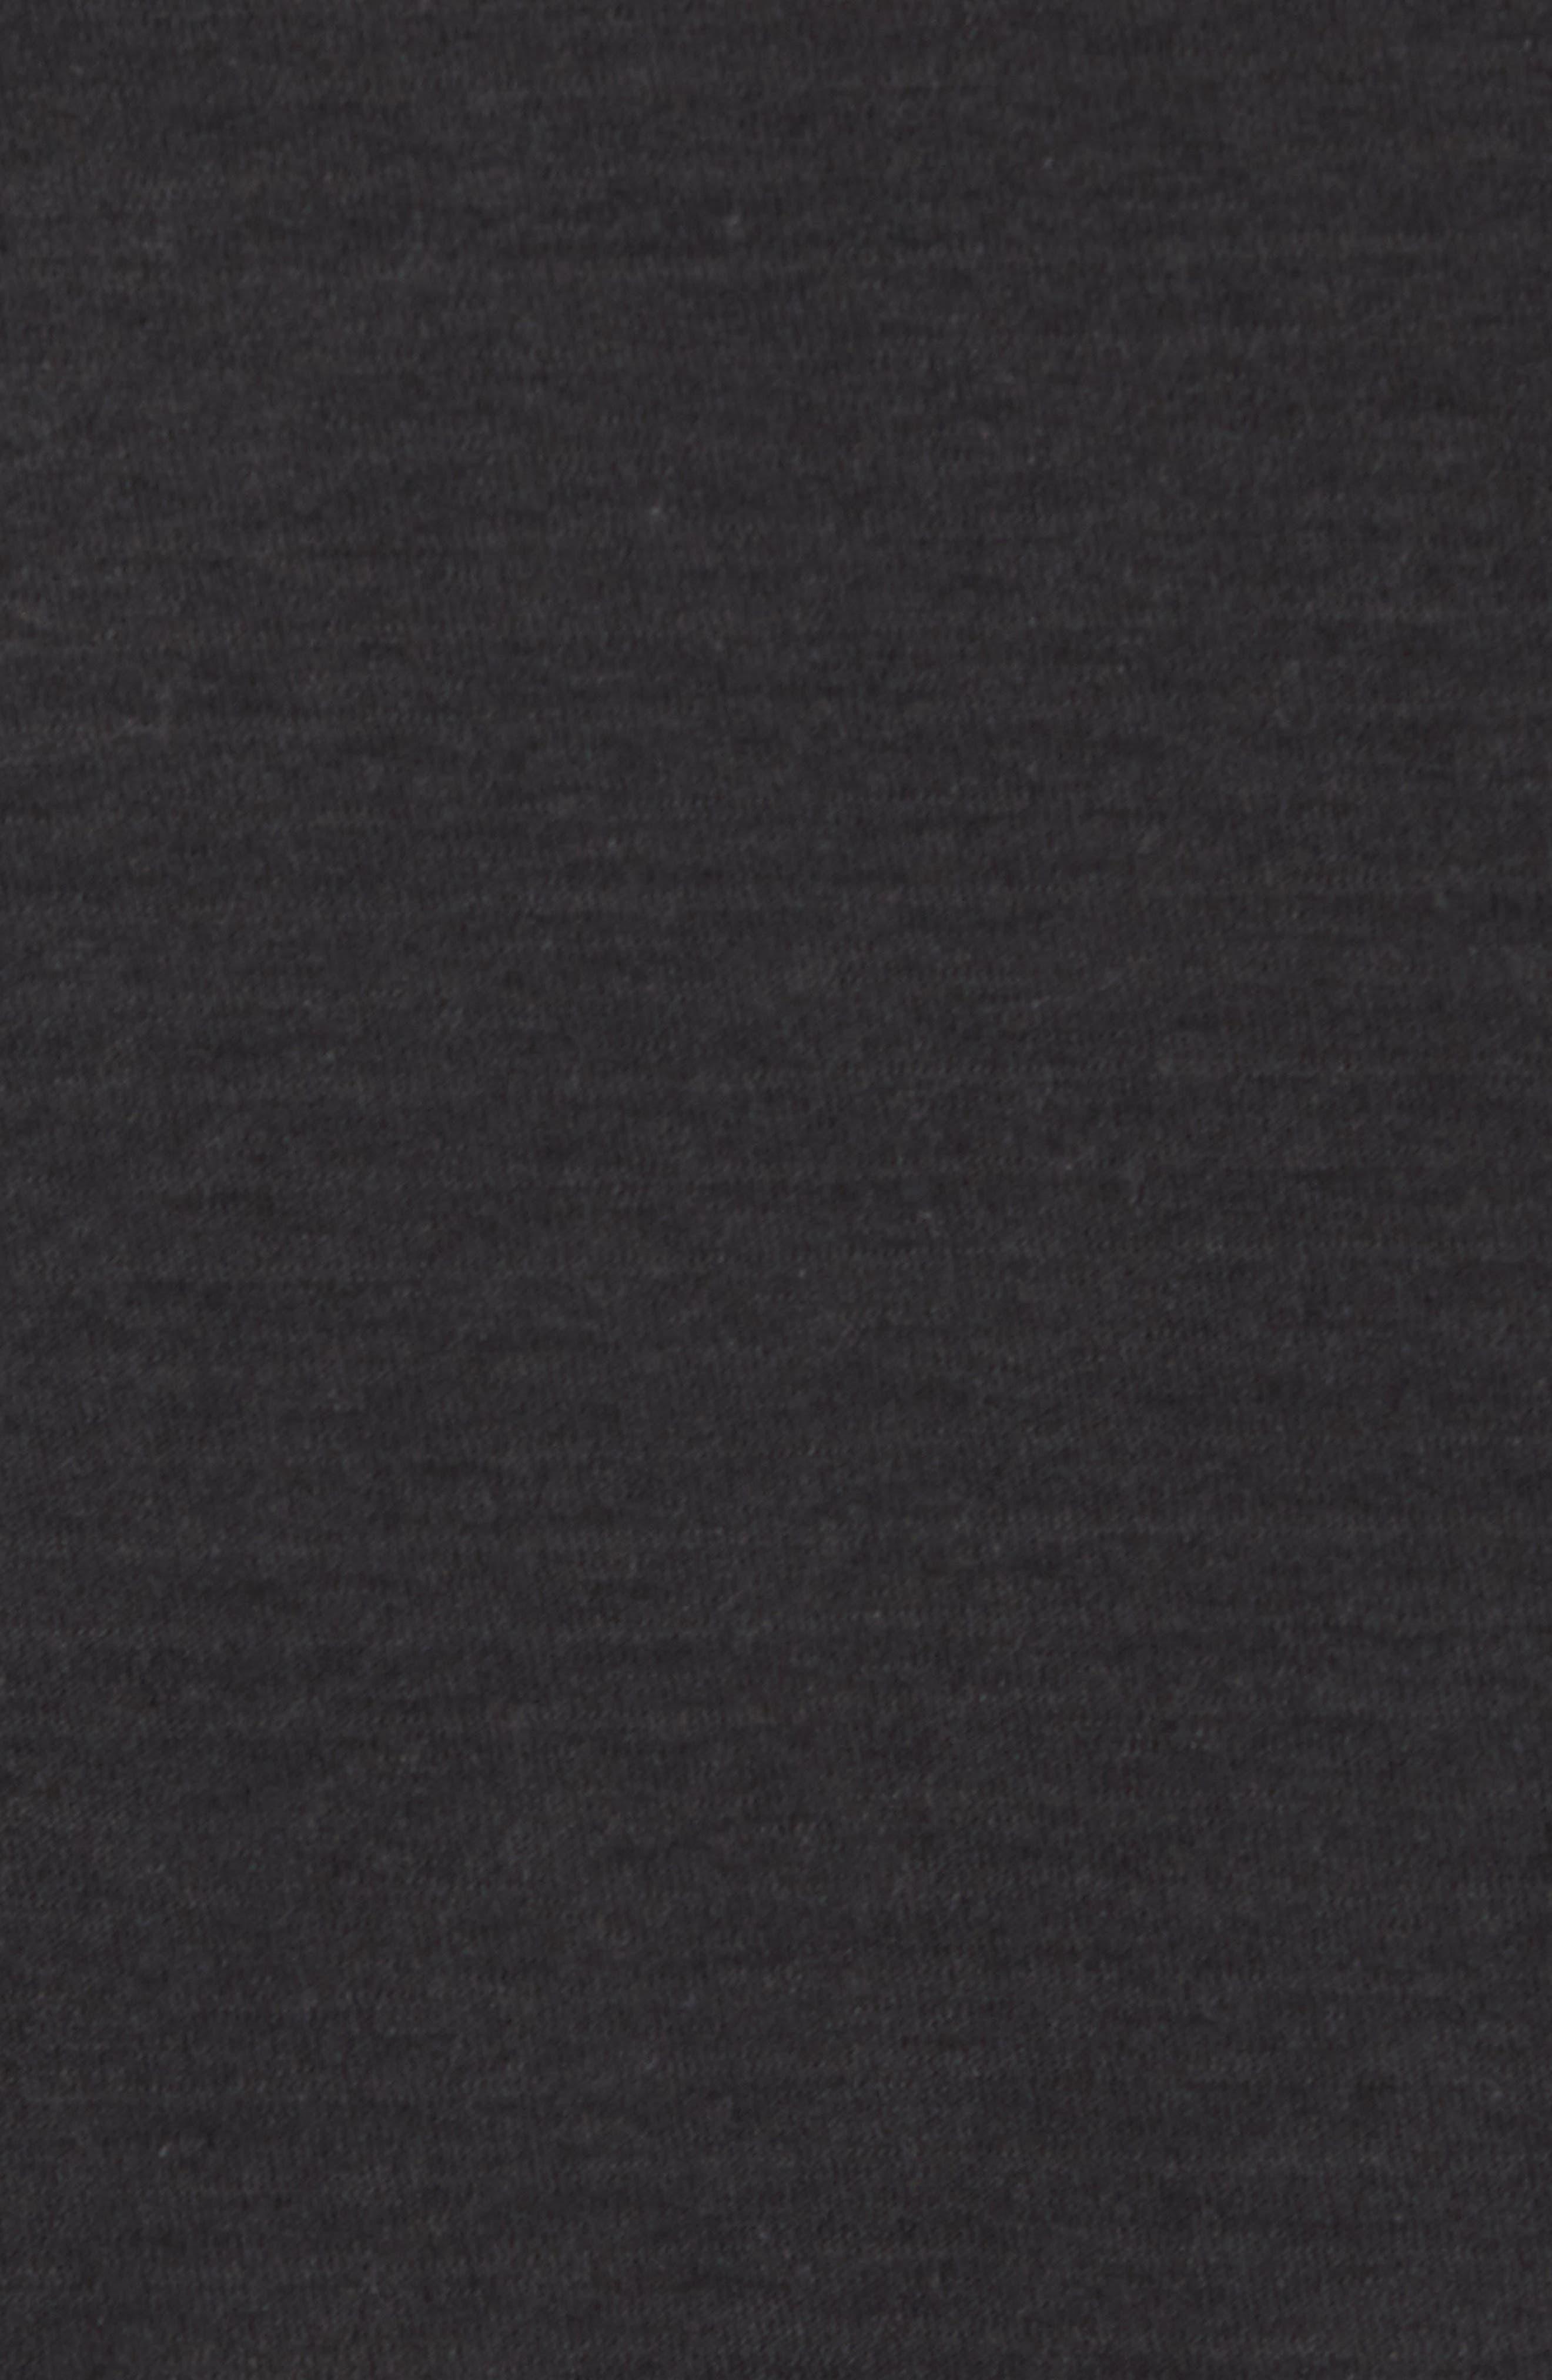 Microstripe Long Sleeve Raglan T-Shirt,                             Alternate thumbnail 5, color,                             CARBON